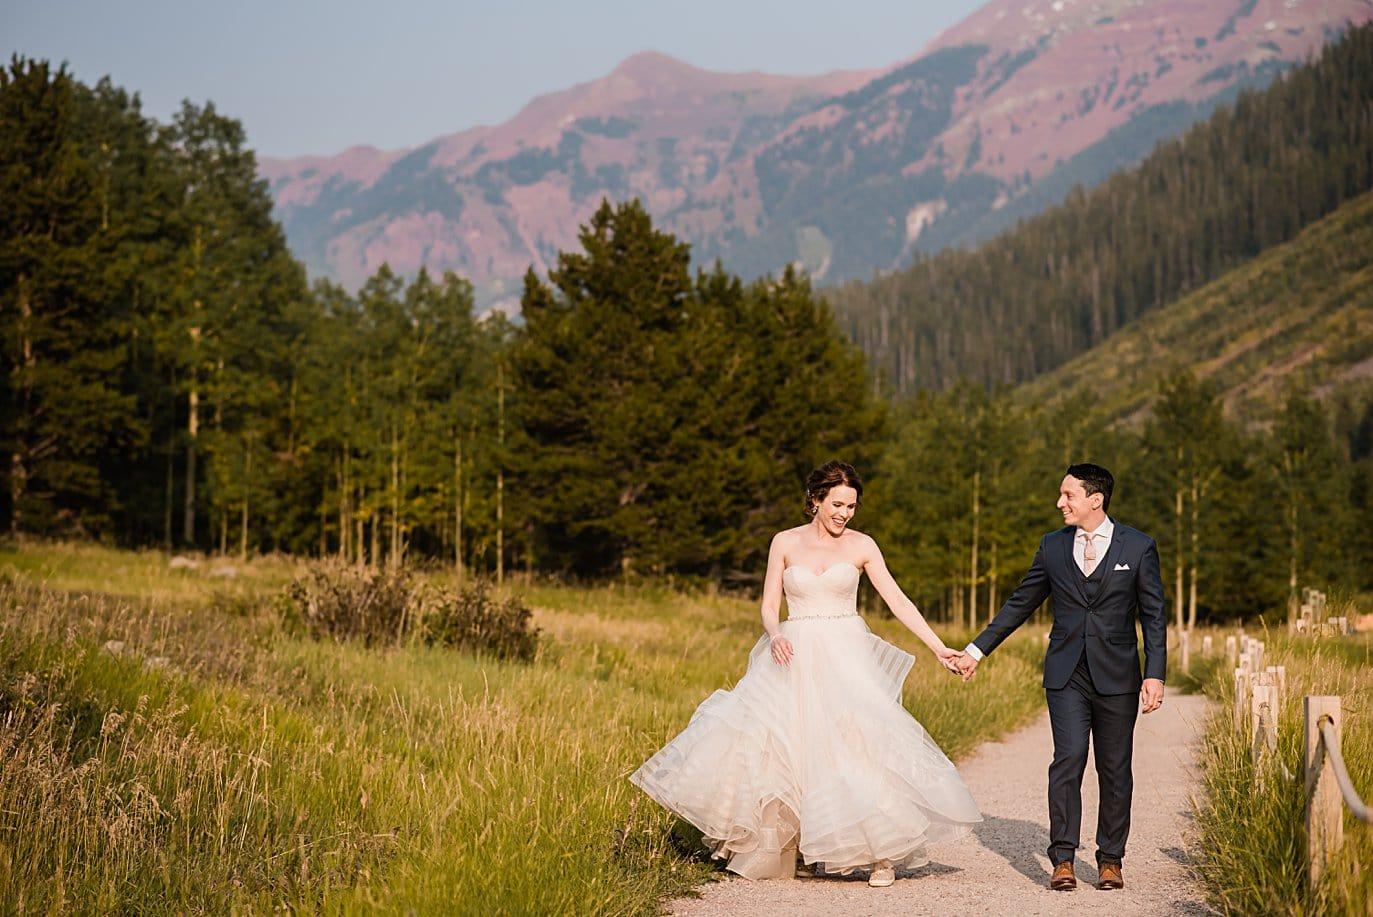 alpenglow at fall Maroon Bells wedding by Aspen wedding photographer Jennie Crate